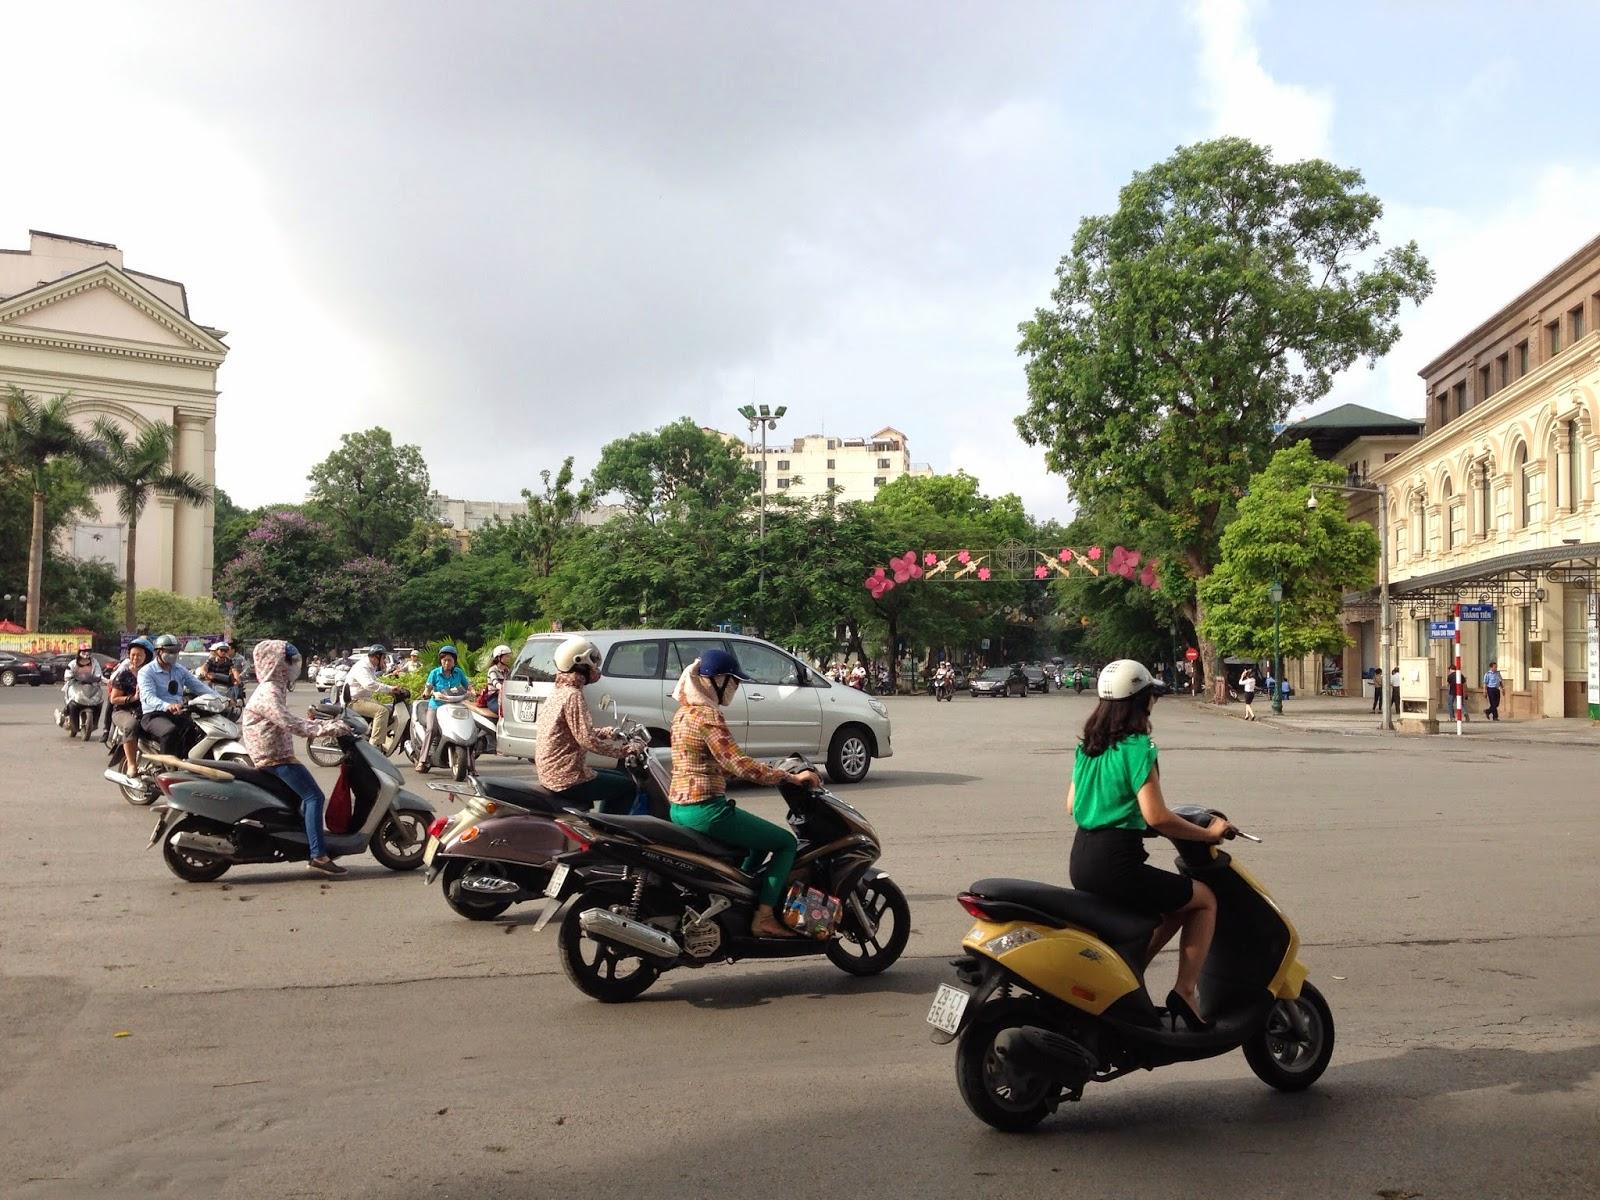 Many-motorbikes-hanoi-Vietnam